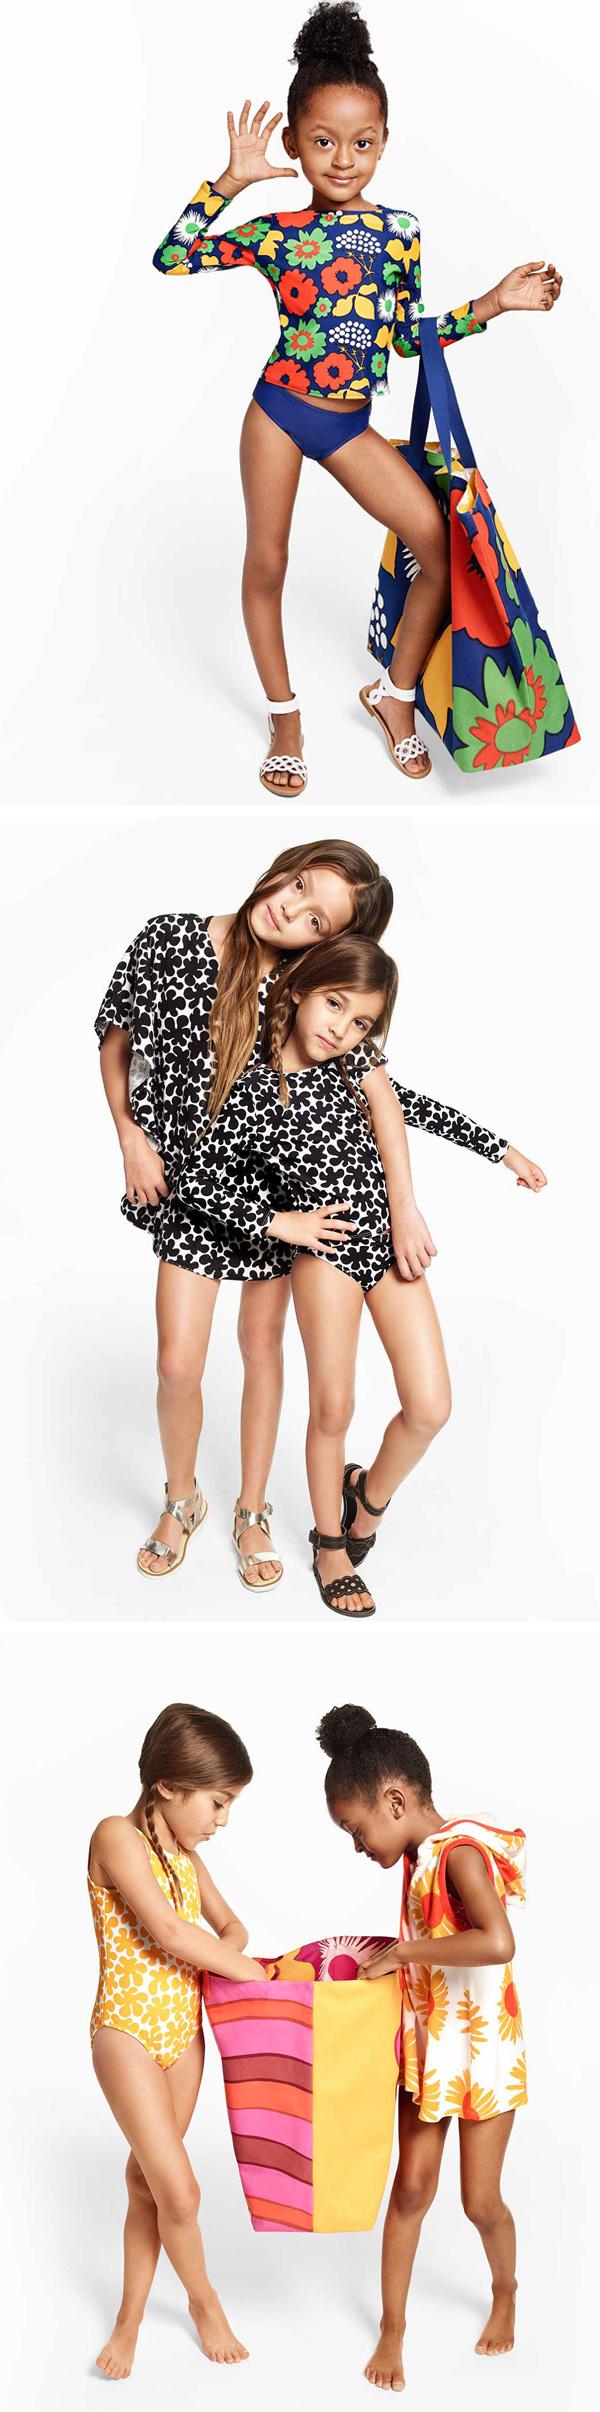 Marimekko for Target Girls Collection